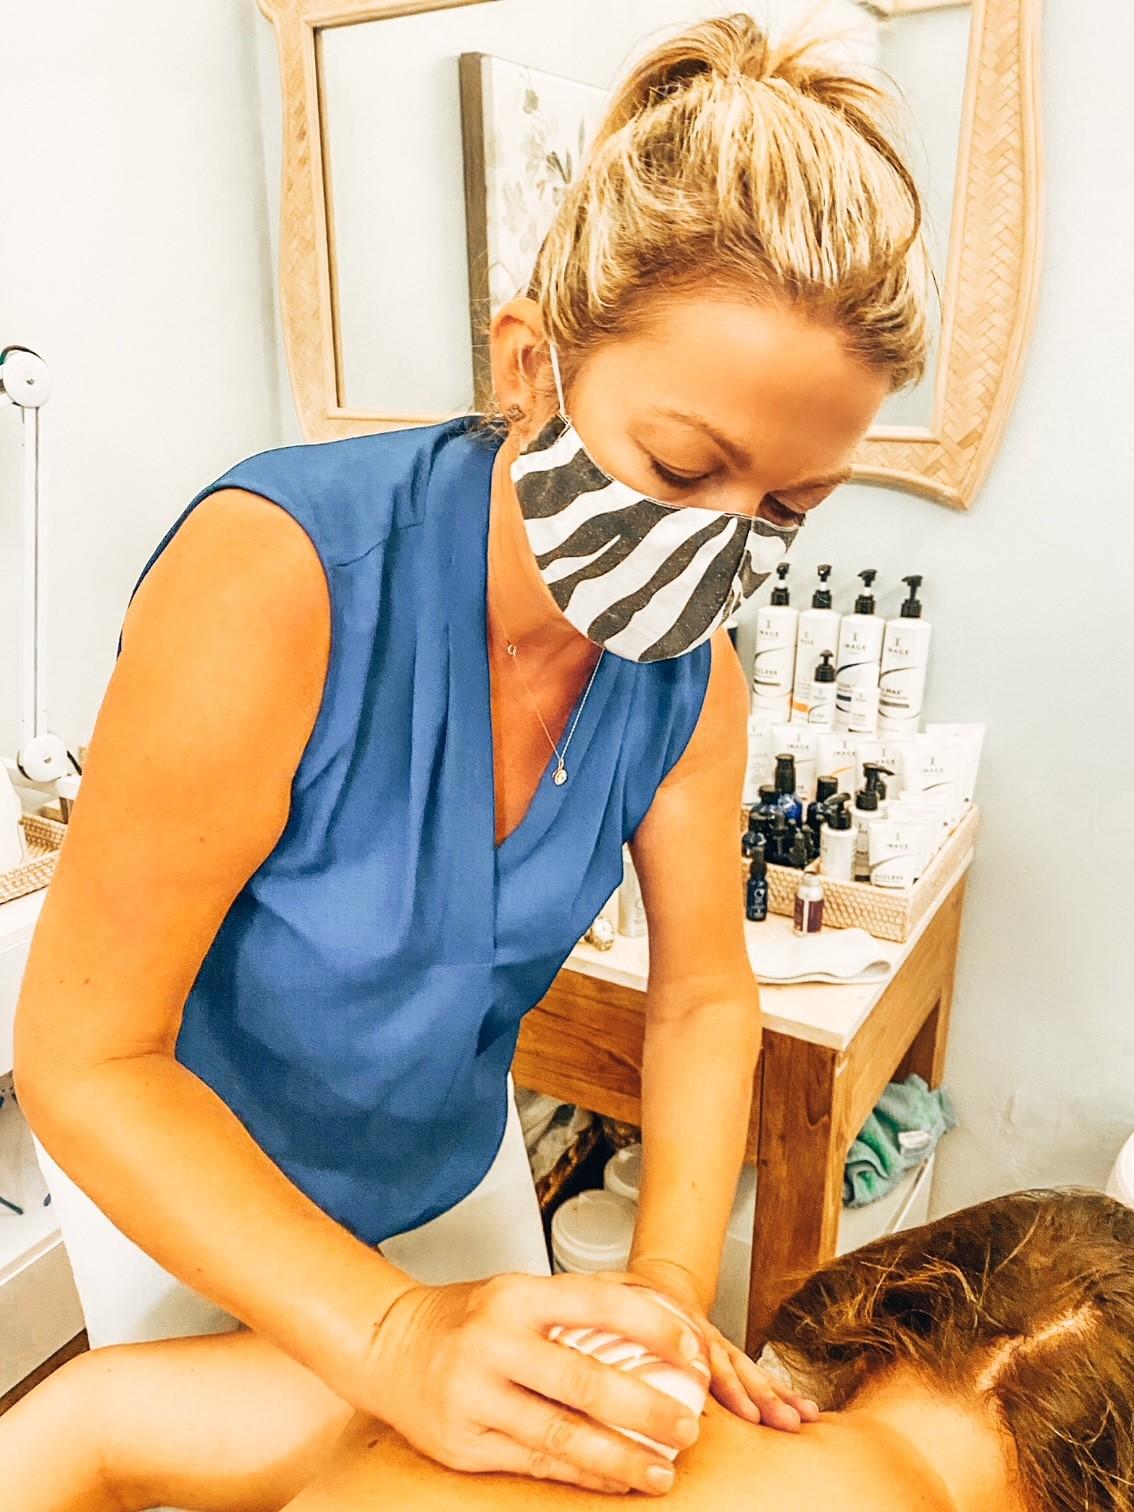 Massage Treatment at Spa and Sparkle, British Virgin Islands